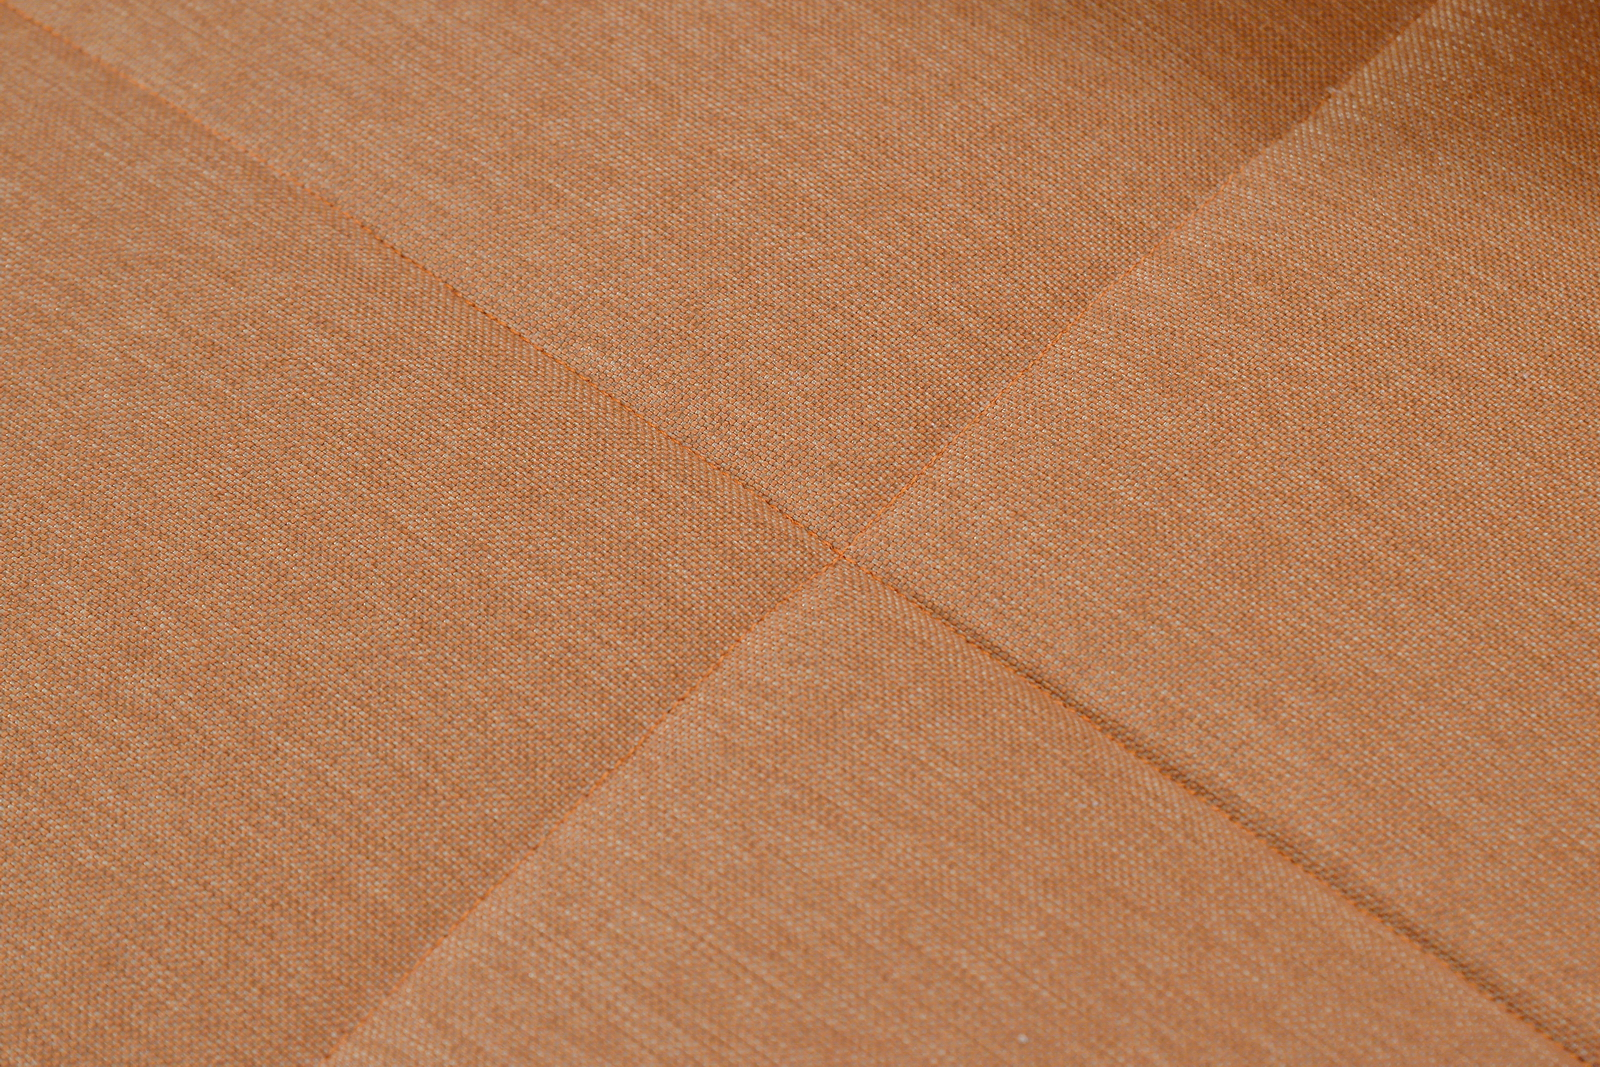 PTendercool-Ourdoor-Sofa-PT73(x8)-BS1-TE-DO-Palm Plain (Henna)-191101-07